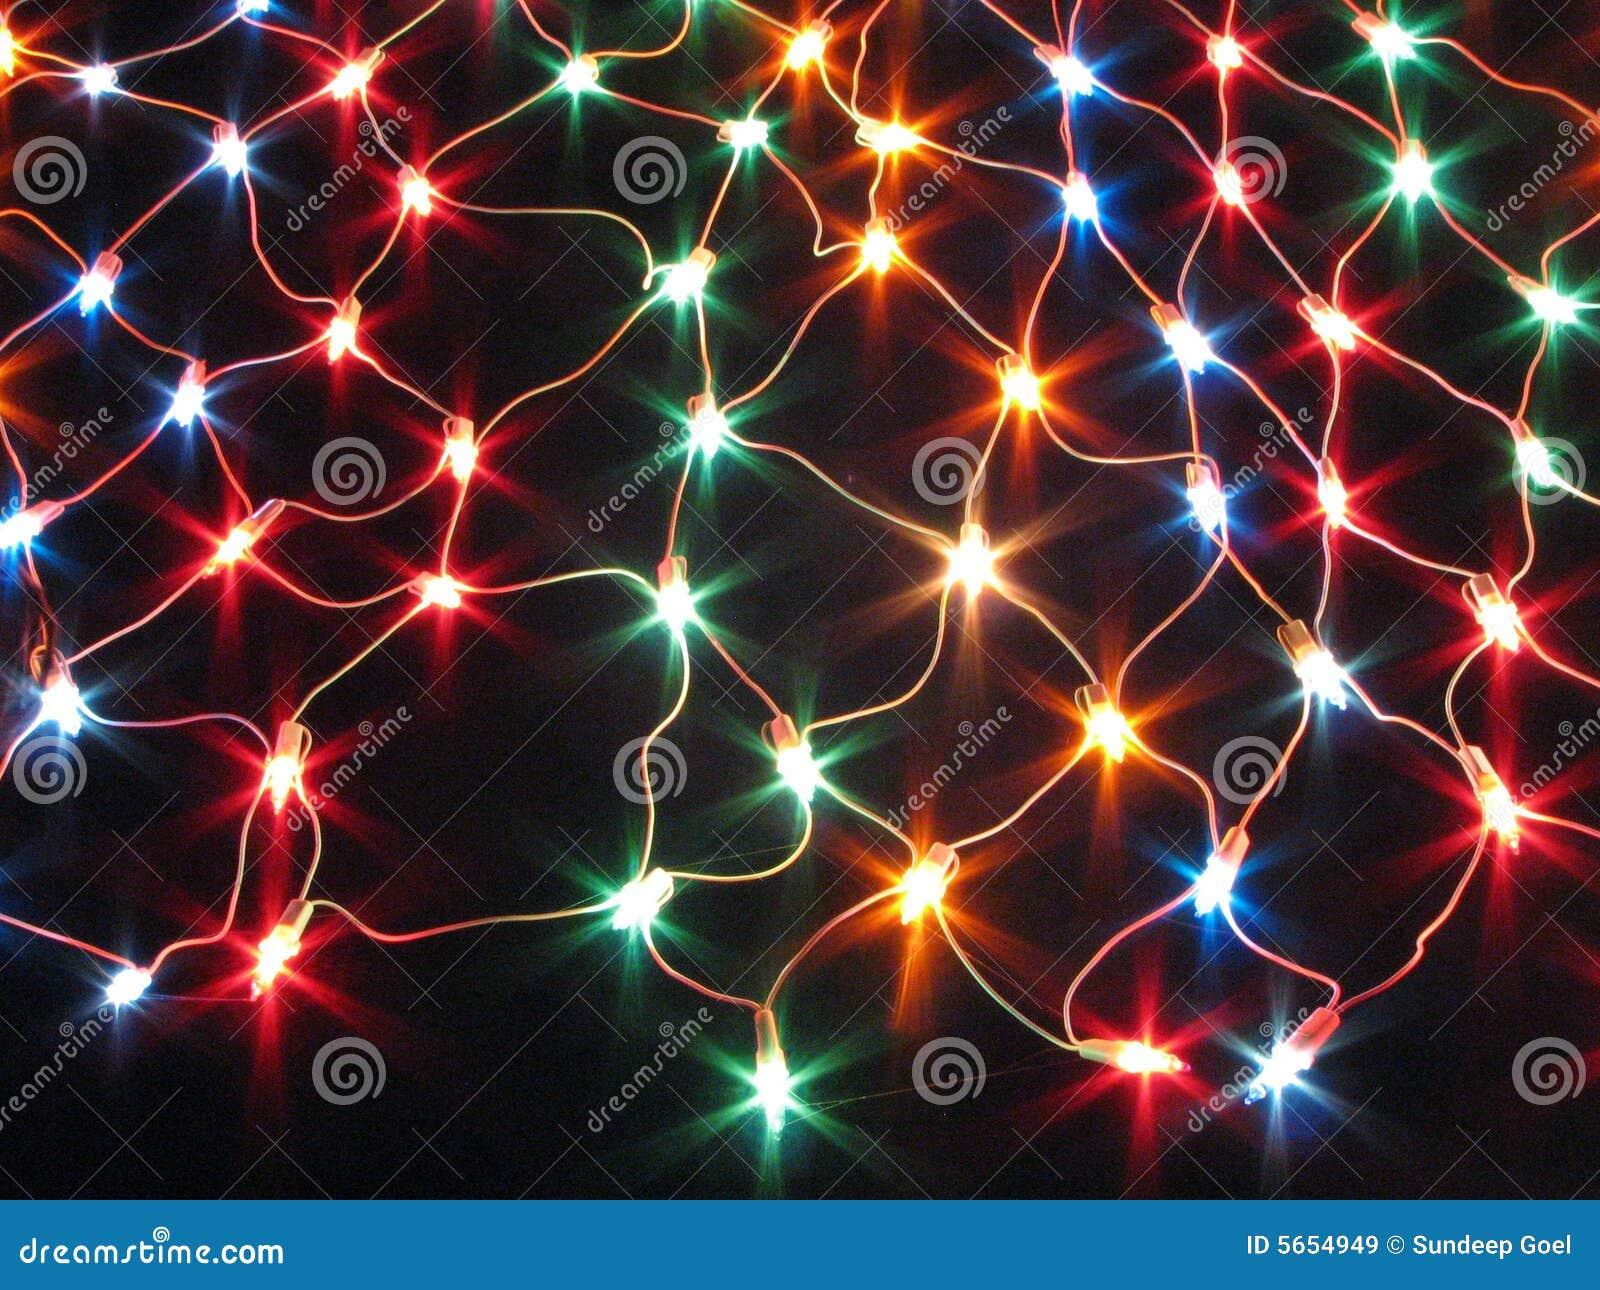 Colourful decorative light net string